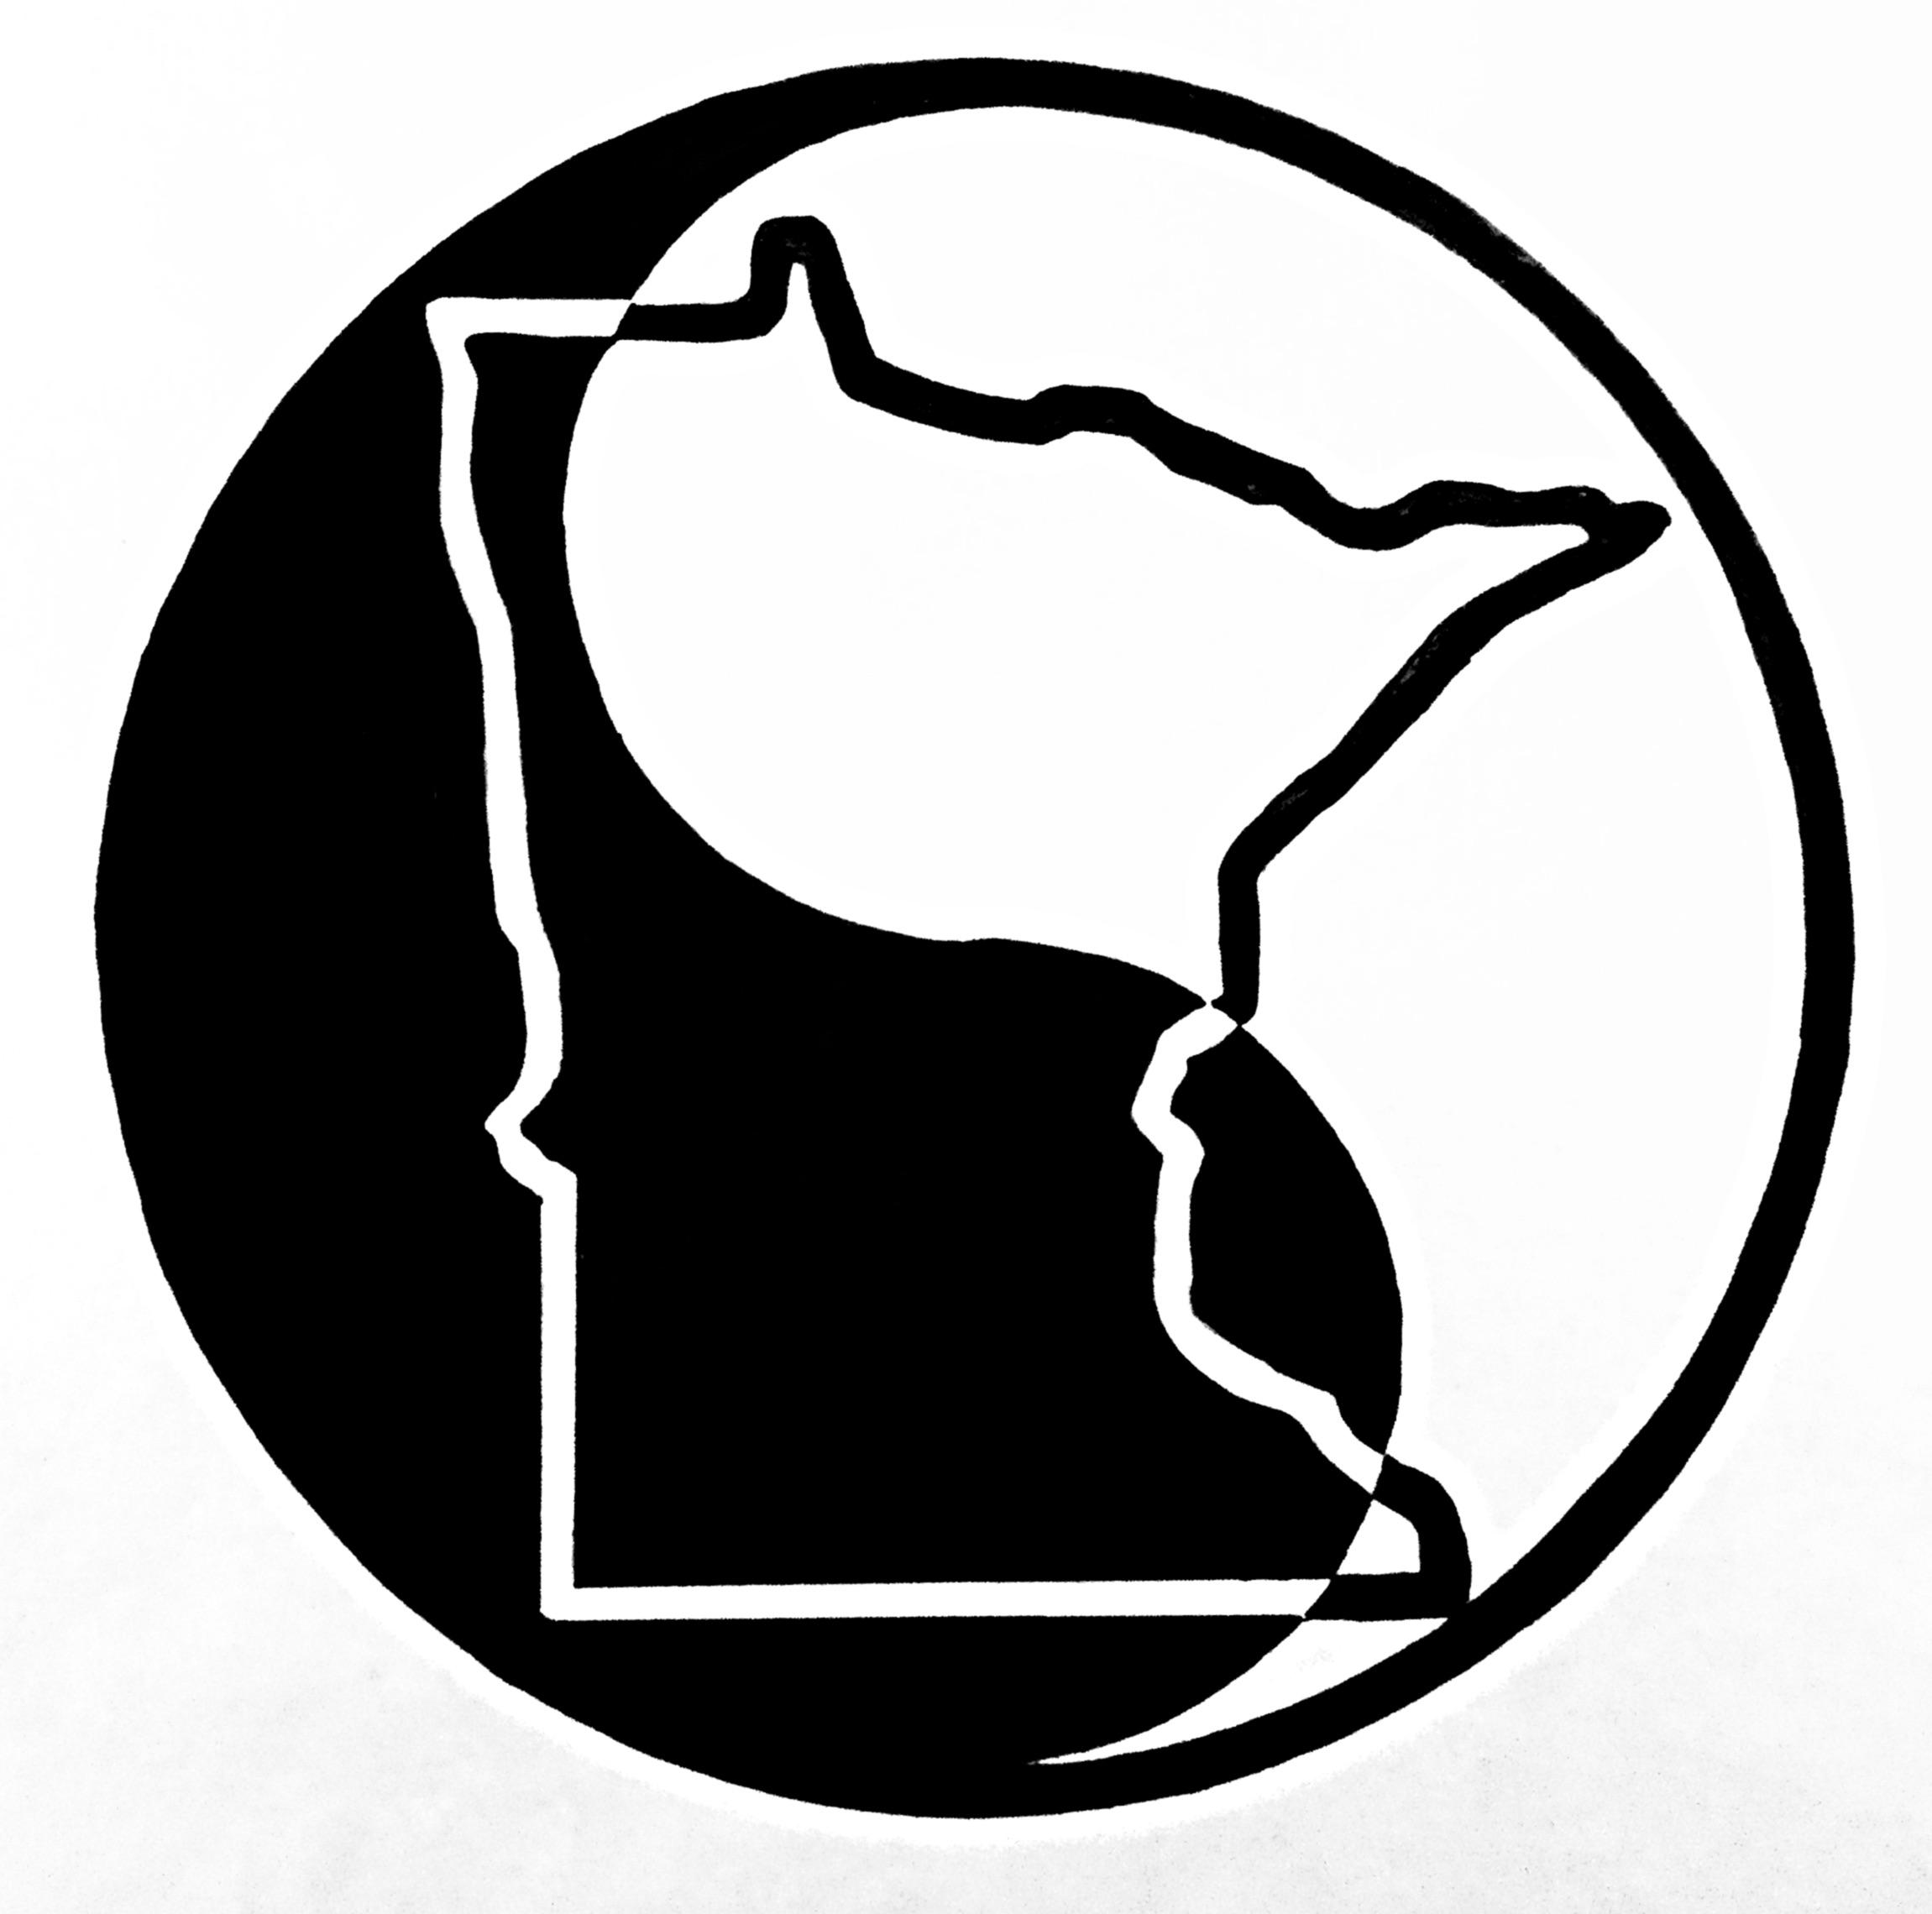 MNTC-logo-version2 copy.jpg